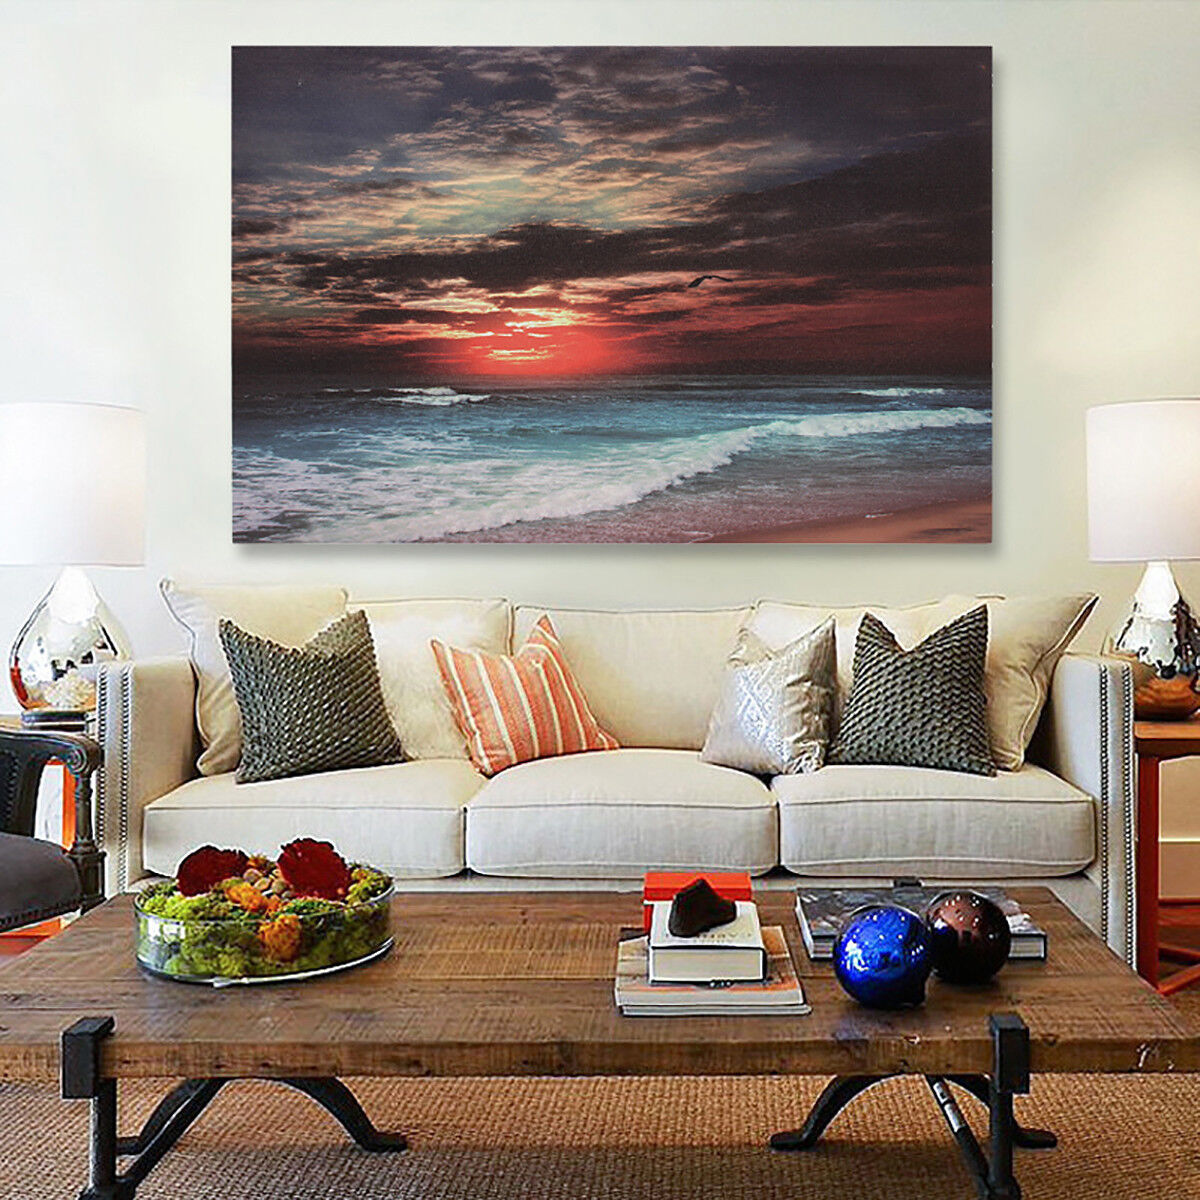 Купить Unbranded - Framed Sunset Beach Sea Modern Canvas Art Painting Print Wall Picture Home